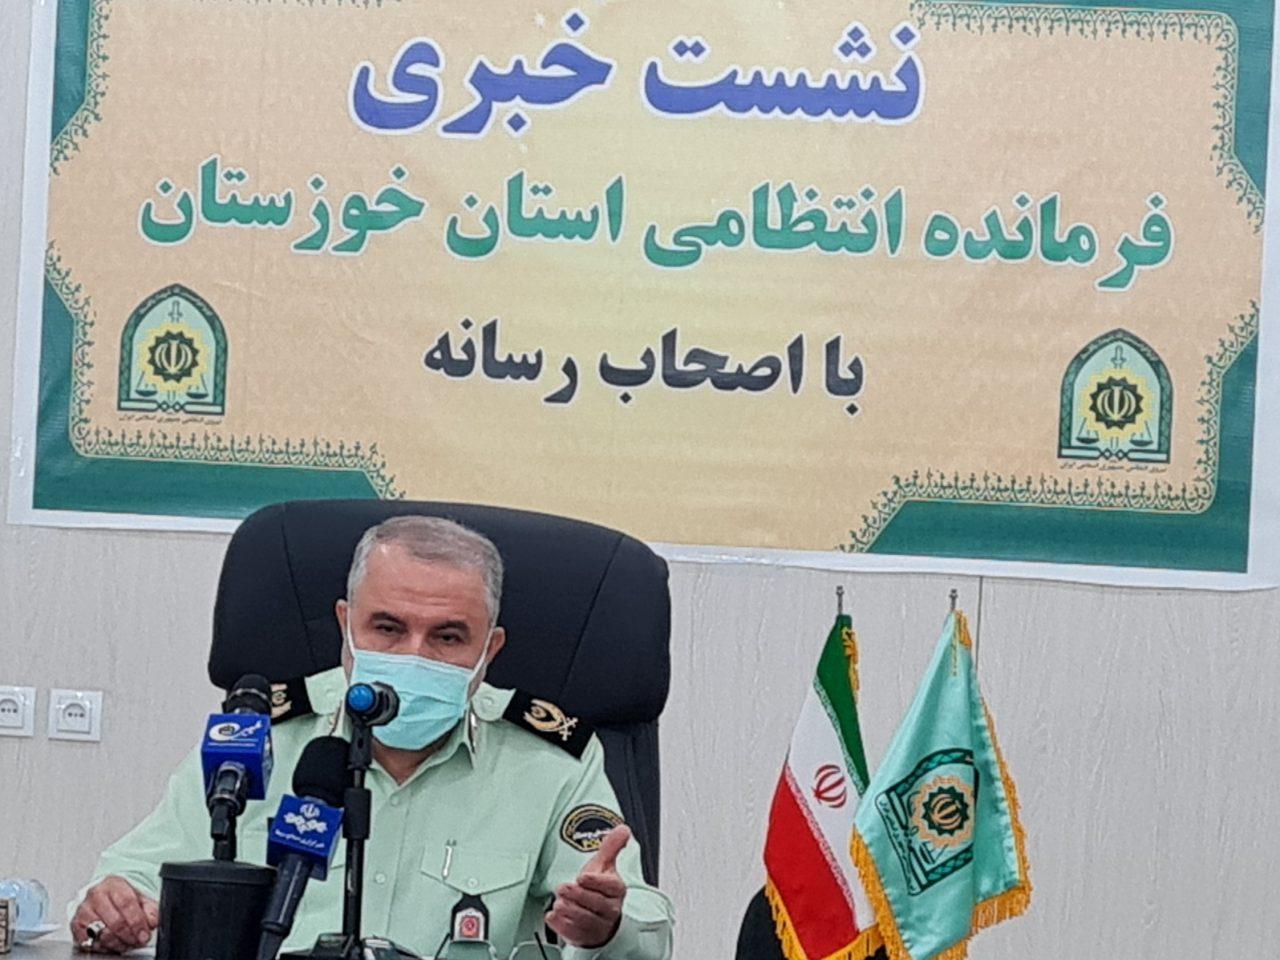 ۲۰۲۱۰۶۲۶ ۲۳۵۱۱۲ 1280x960 کشف بیش از 4 تُن انواع مواد مخدر در خوزستان/ افزایش 29 درصدی کشفیات قاچاق/ انهدام 21 باند سرقت مسلحانه/کشف ۱۵۱۲ دستگاه ماینر